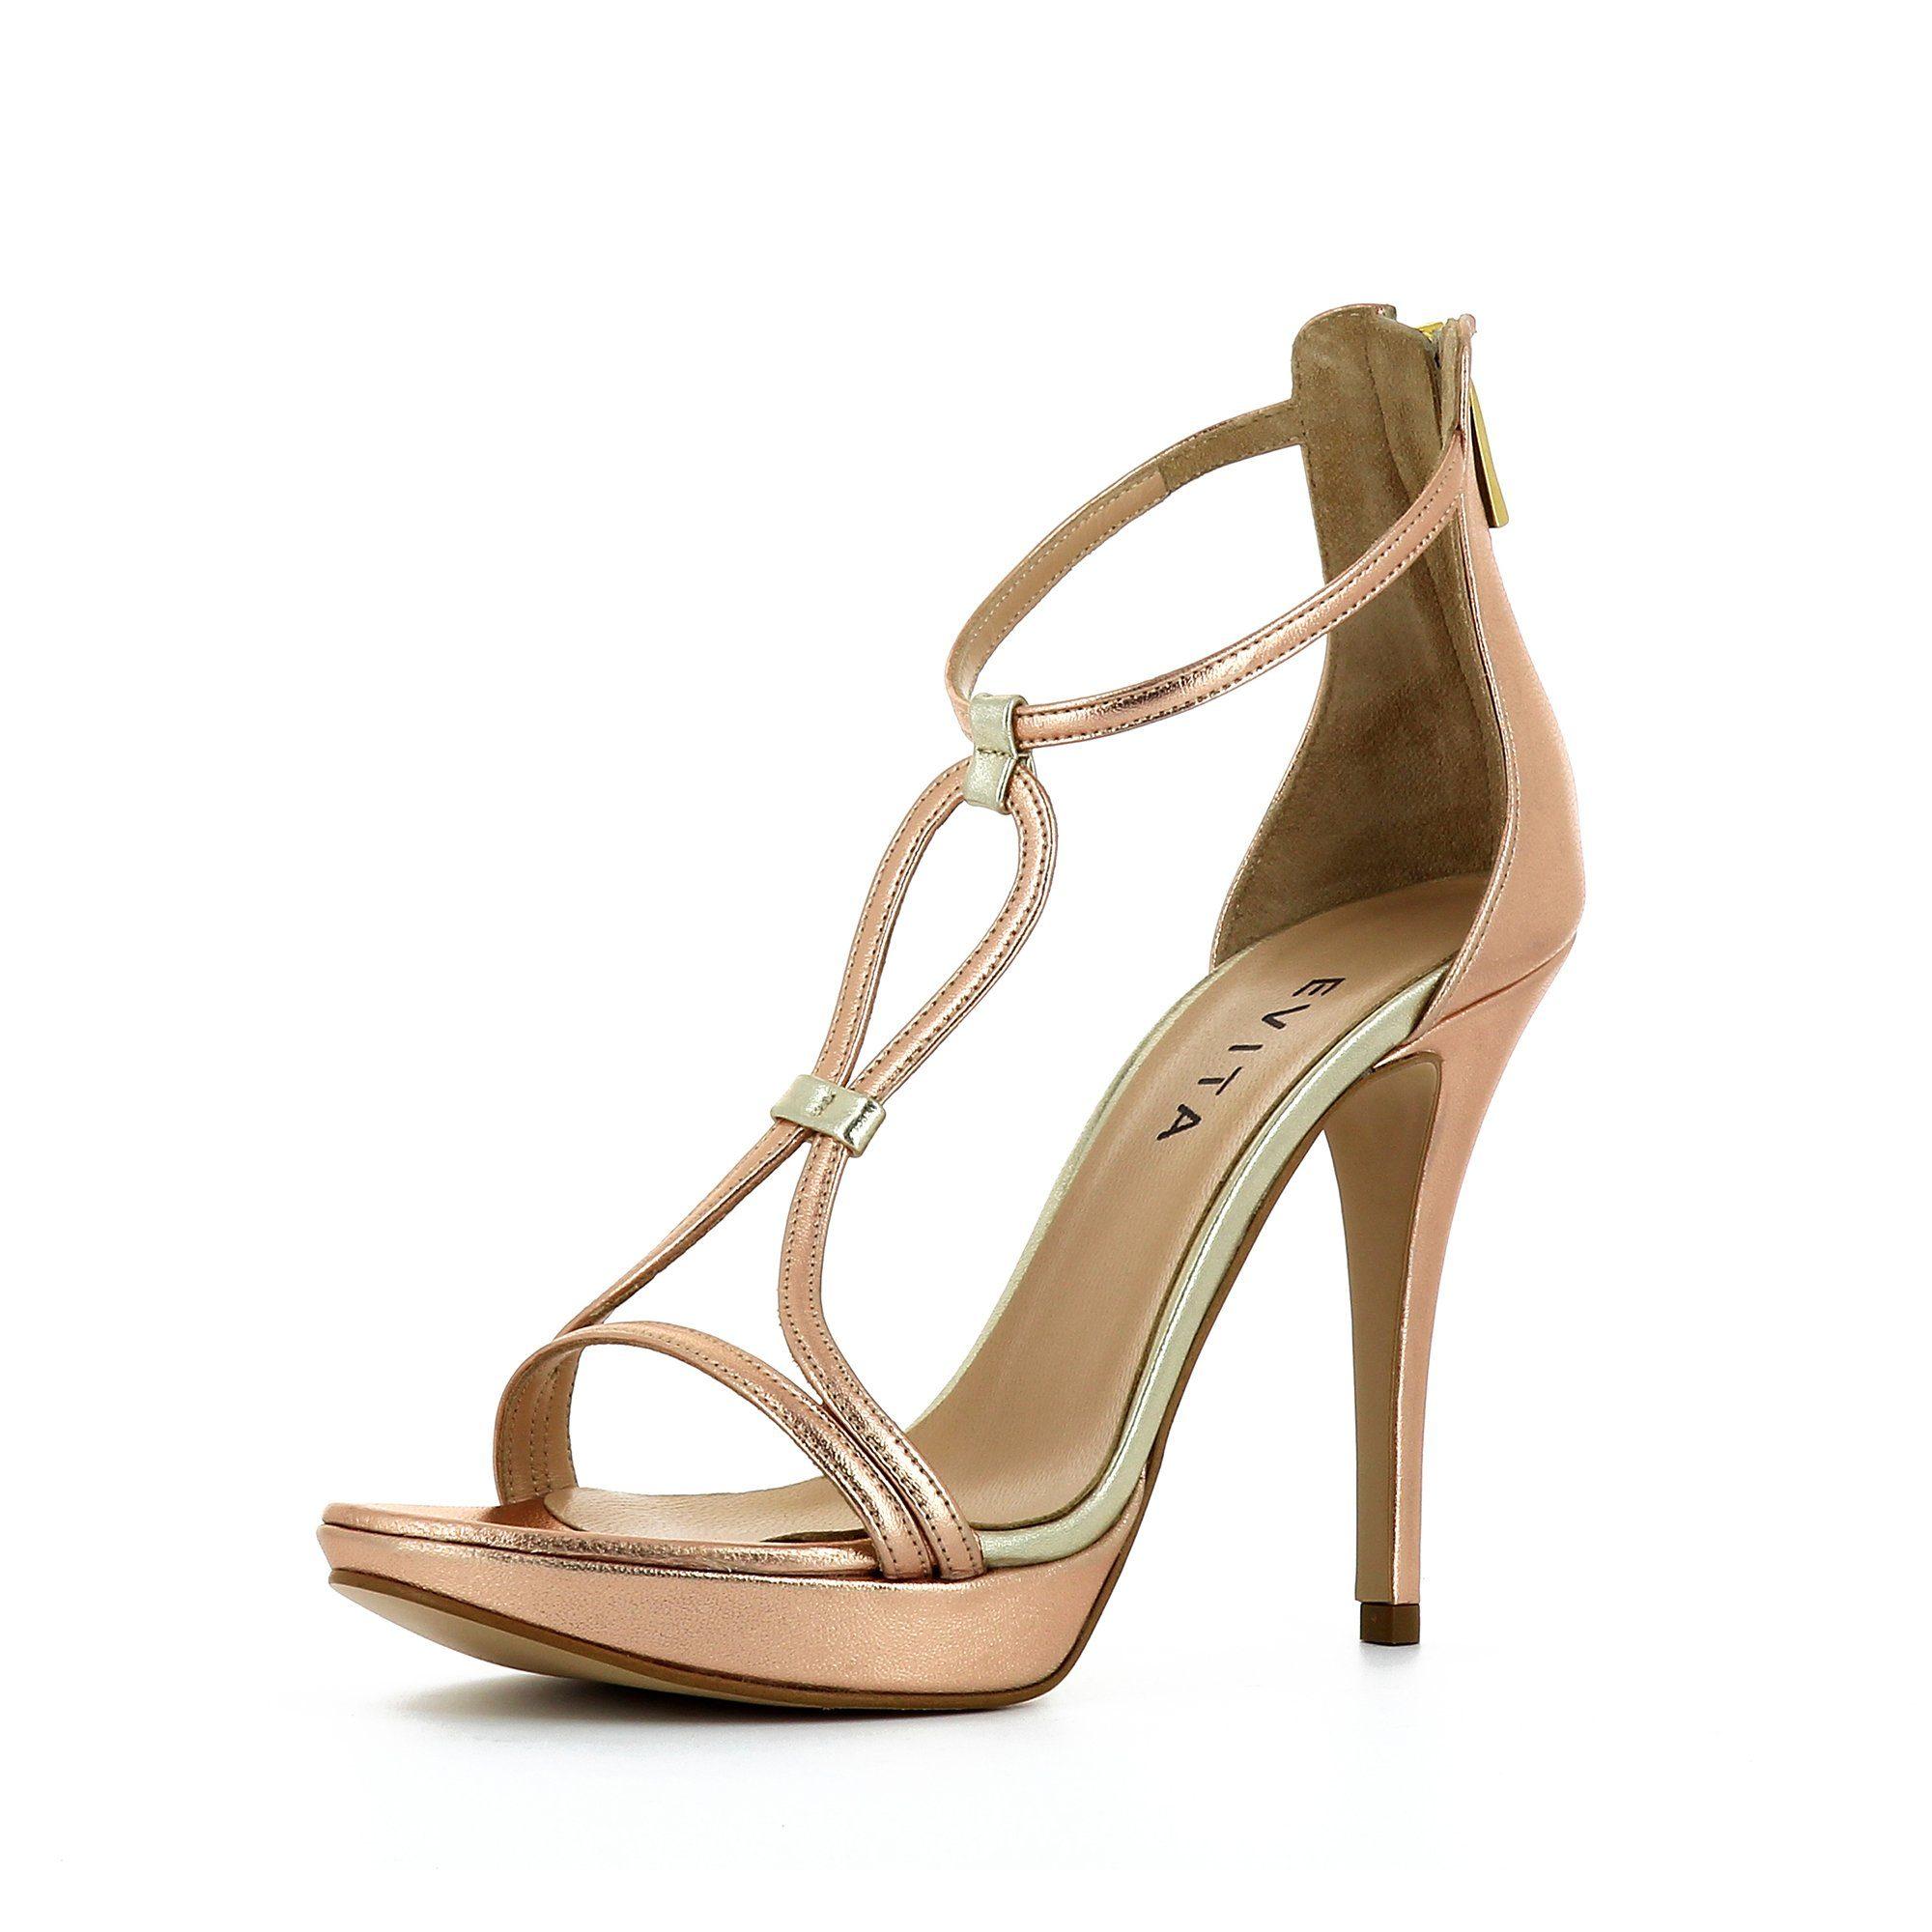 Evita VALERIA Plateausandaletten, High-Heel-Sandalette online kaufen  roségoldfarben